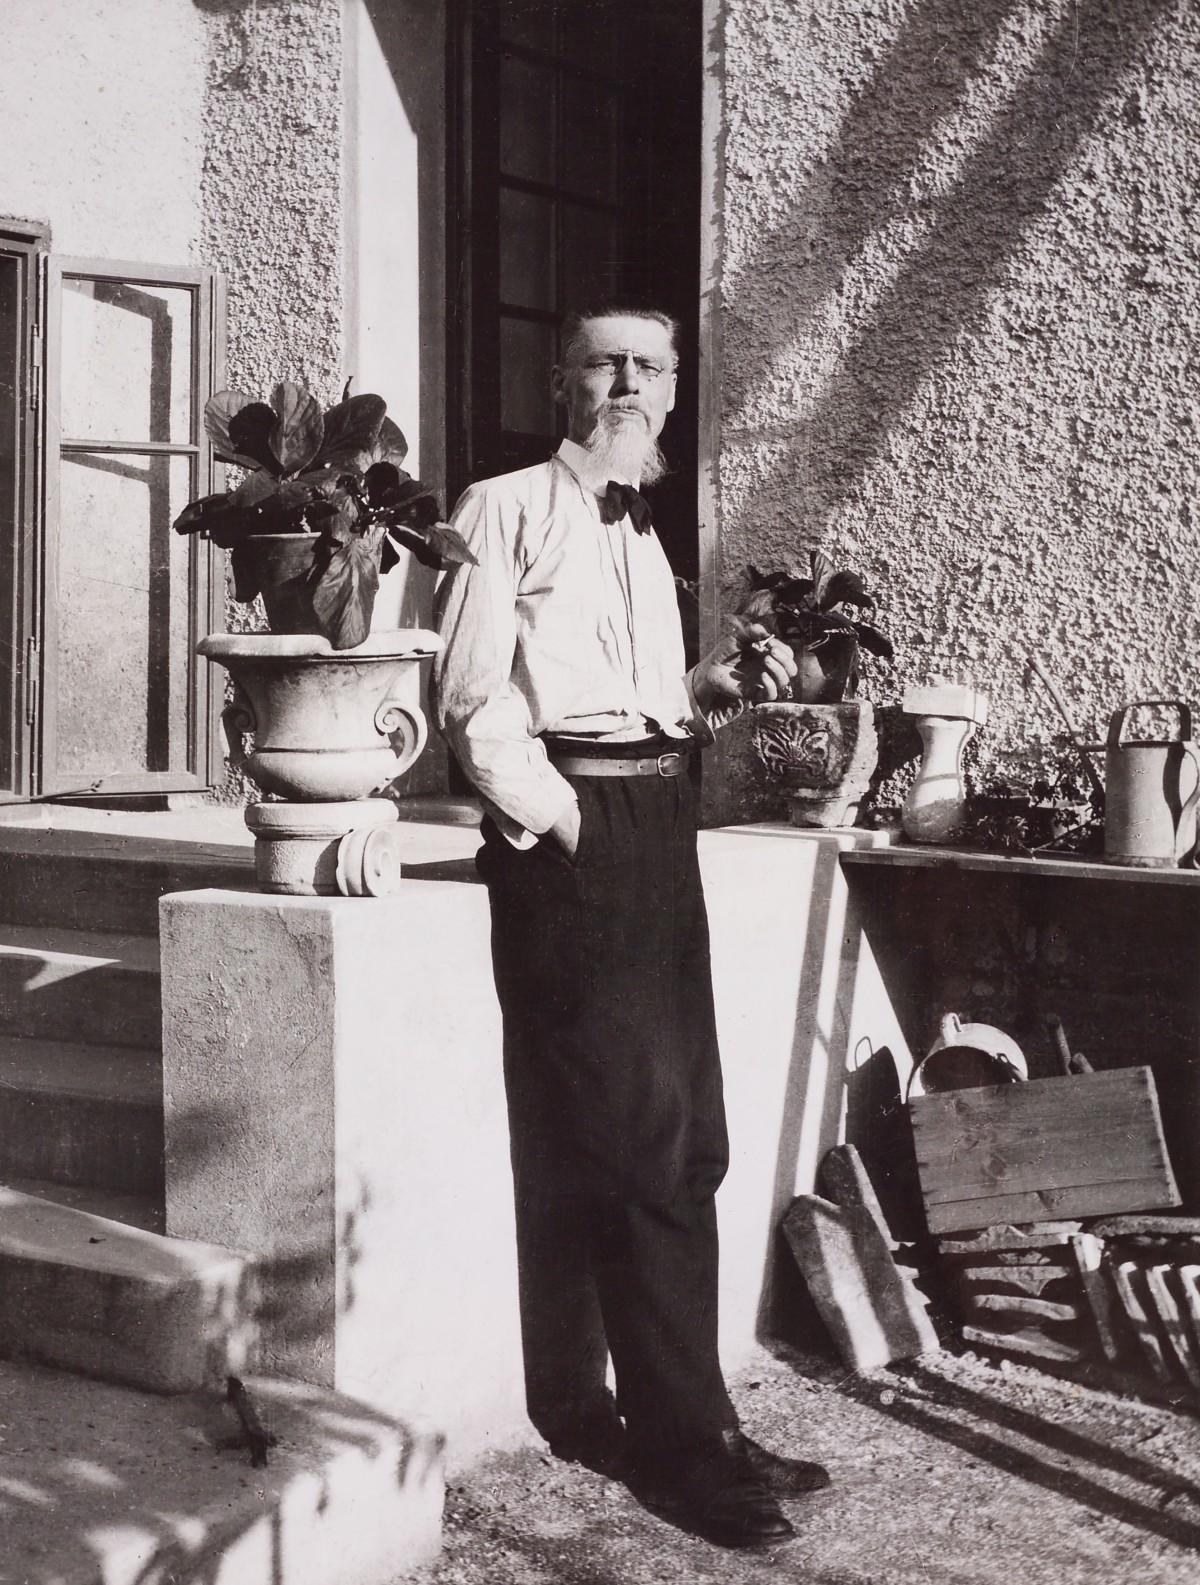 Dokumentacija MGML_Pleƒnik pred svojo hiþo, ok. 1926